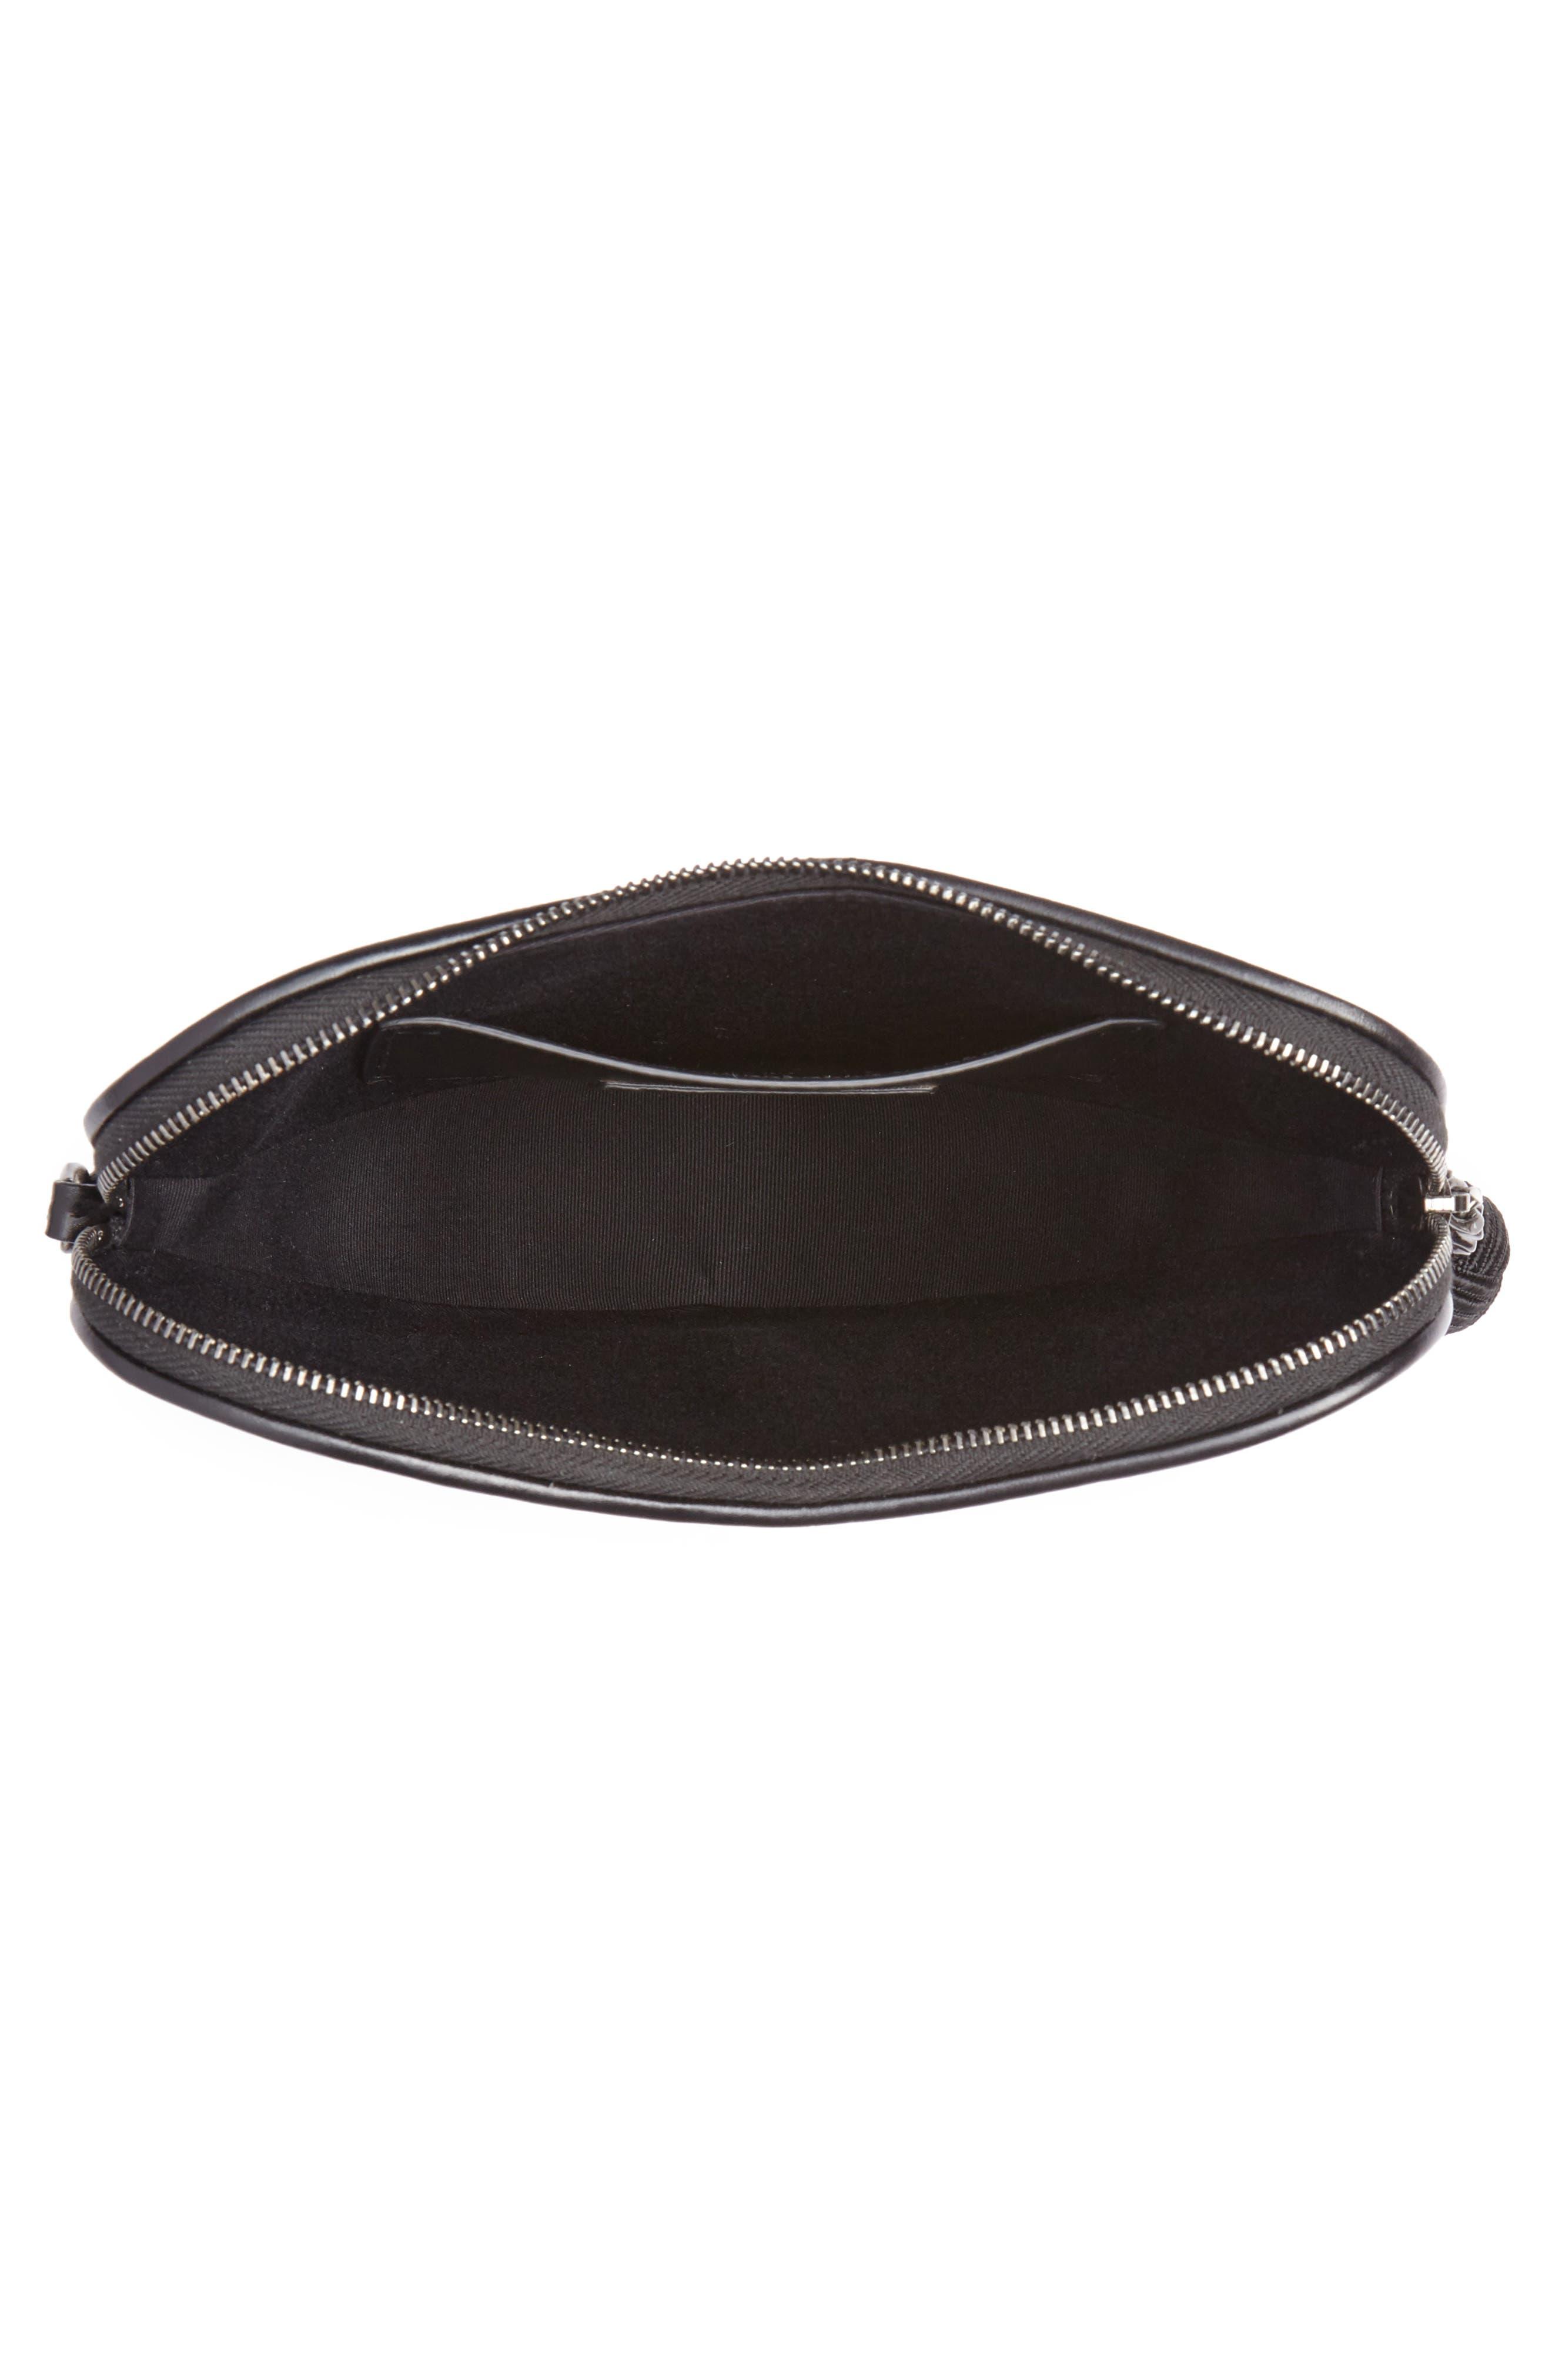 Sac Coeur Leather Crossbody Bag,                             Alternate thumbnail 4, color,                             NOIR/ NOIR